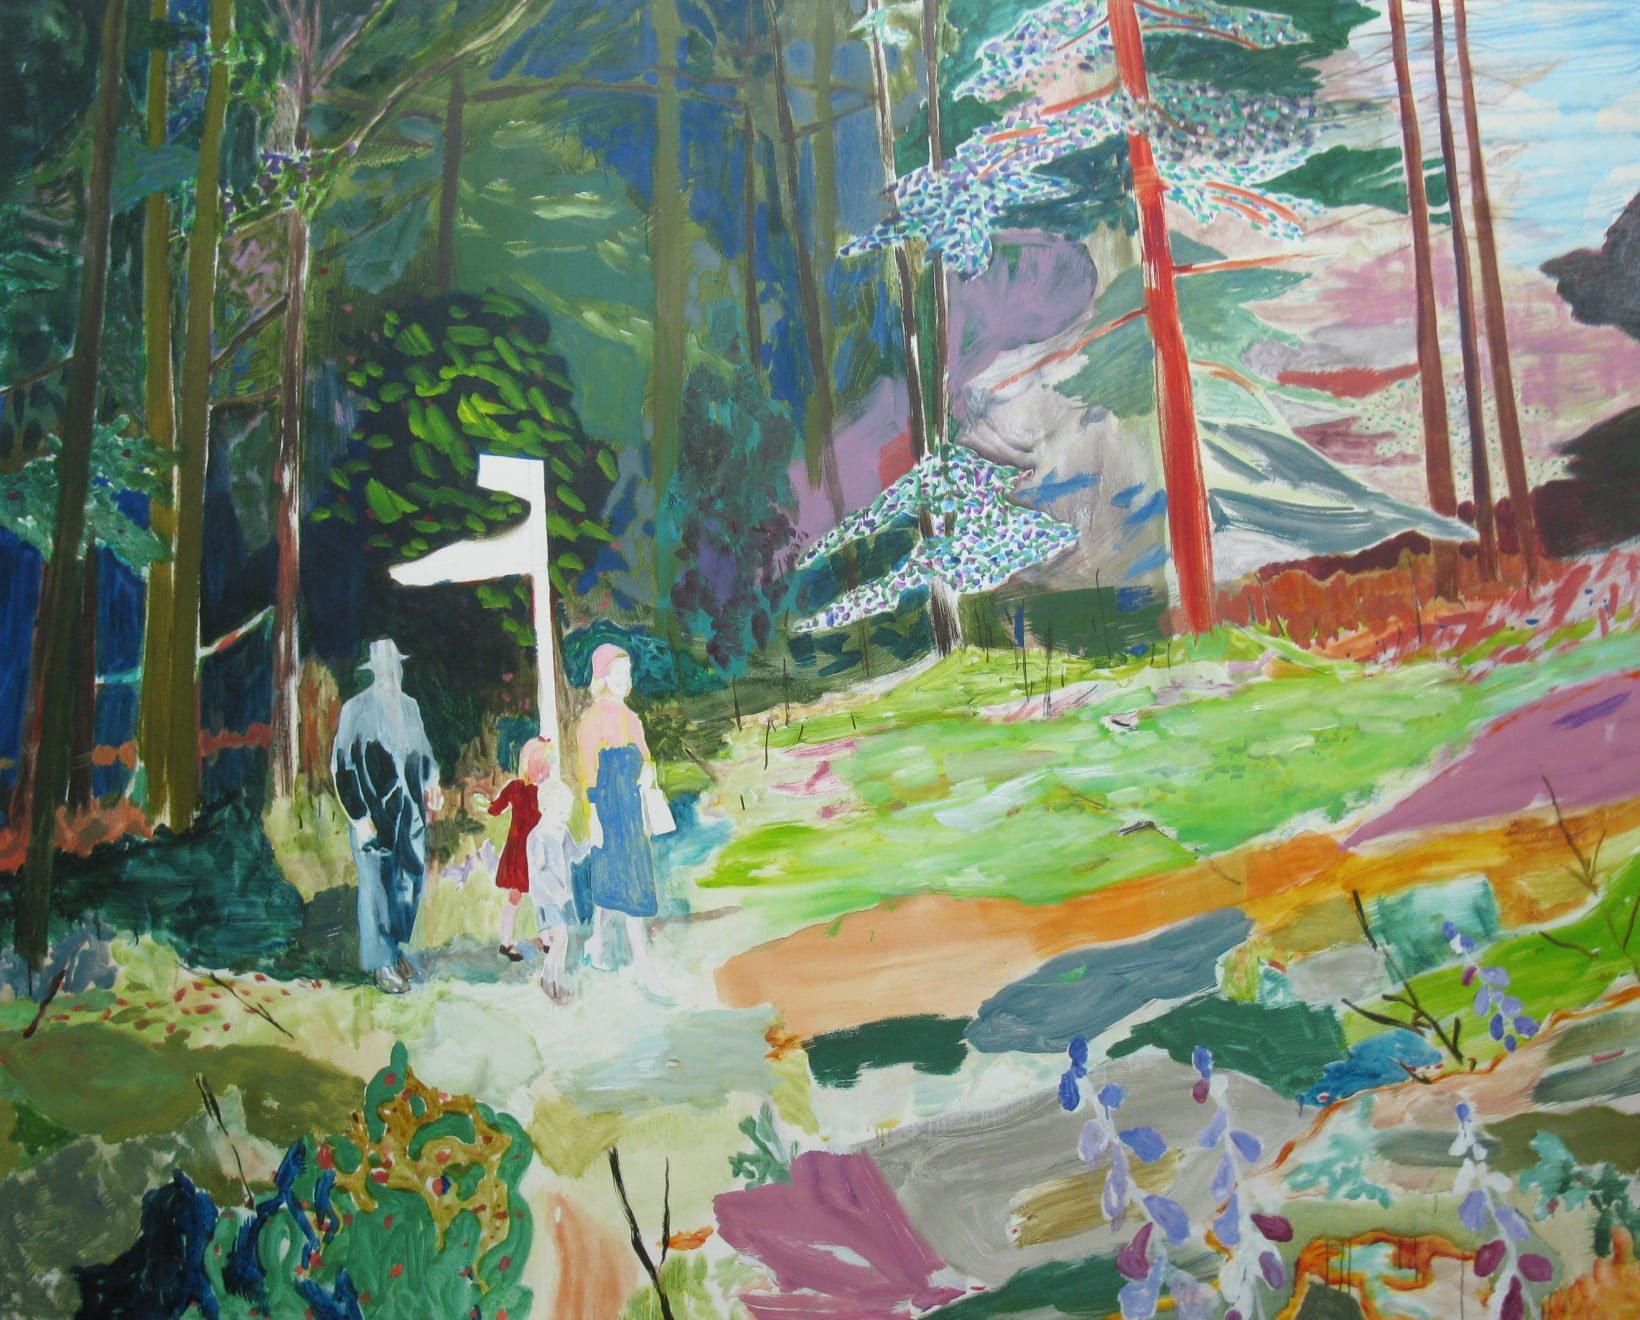 Eleanor Moreton, The Way, 2017